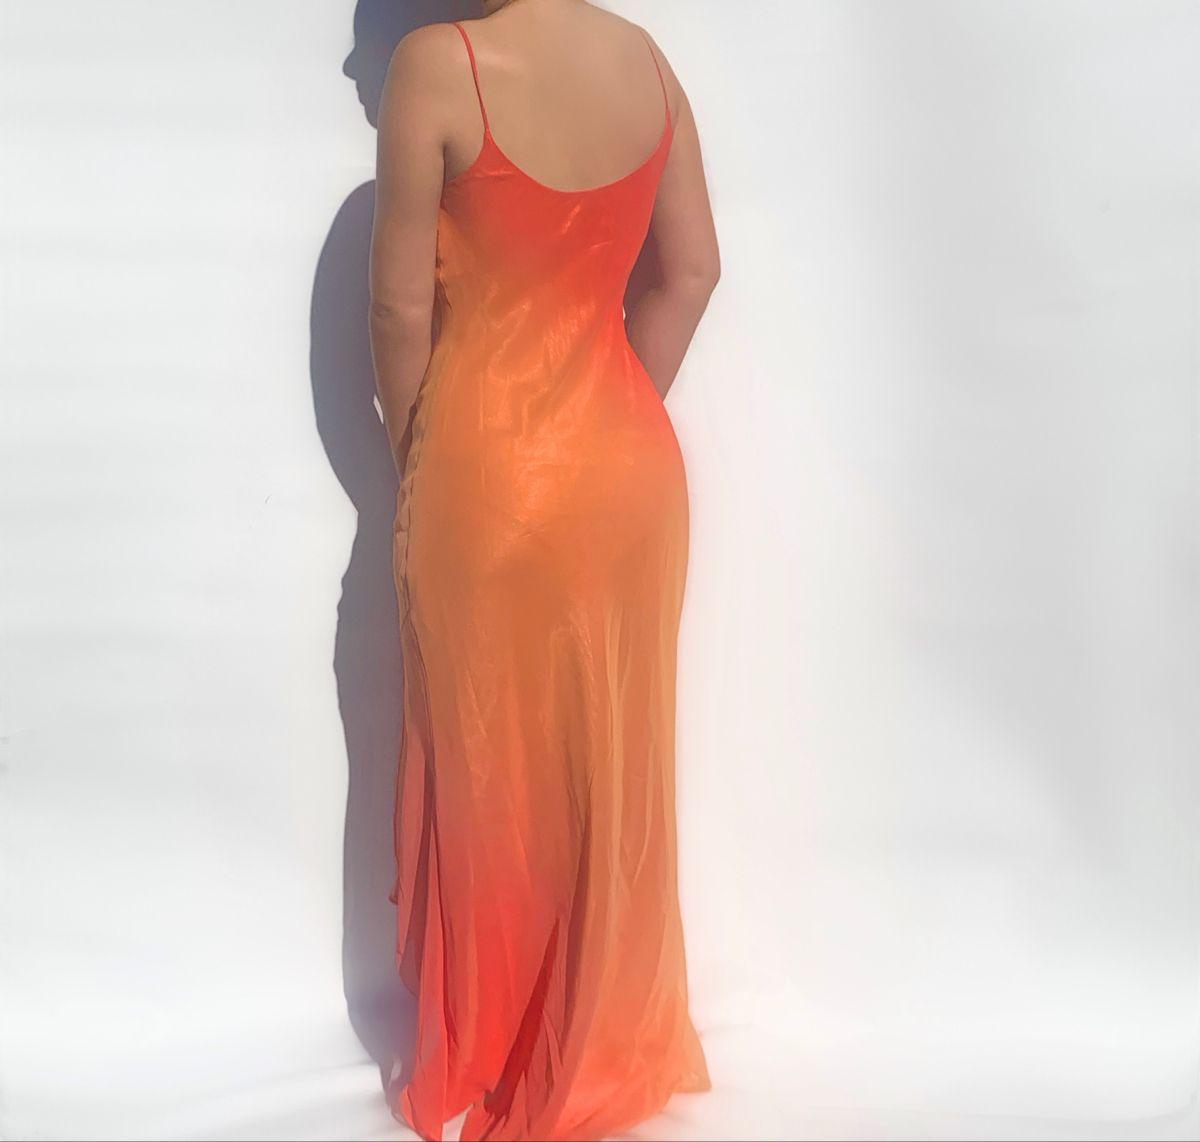 2000s Formal Dress In 2021 Fancy Dresses 90s Prom Dresses Dresses [ 1142 x 1200 Pixel ]